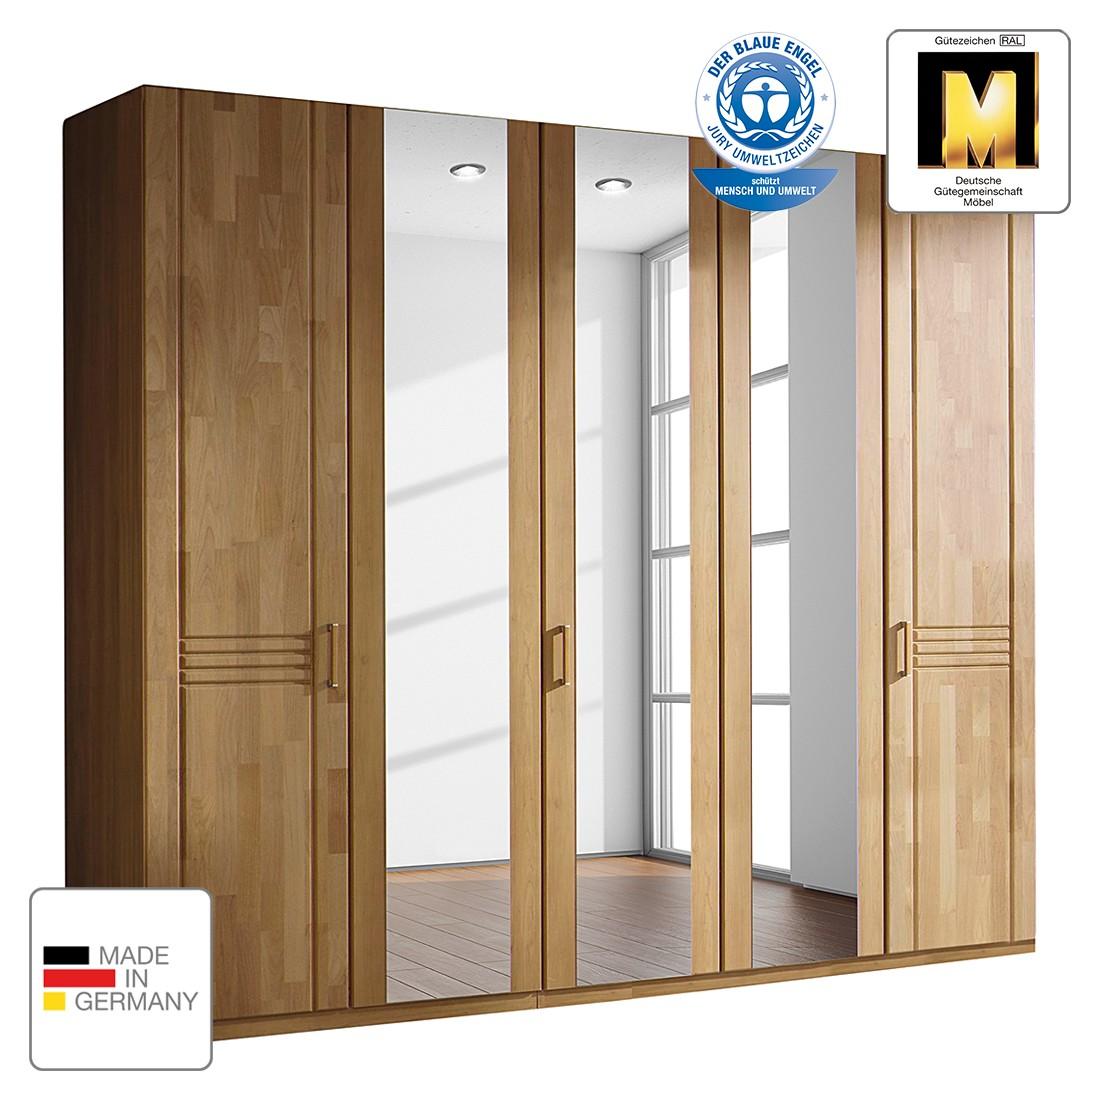 goedkoop Draaideurkast Savina Wild eikenhout 235cm 5 deurs 1 spiegeldeur Zonder Passe partout lijst Rauch Steffen